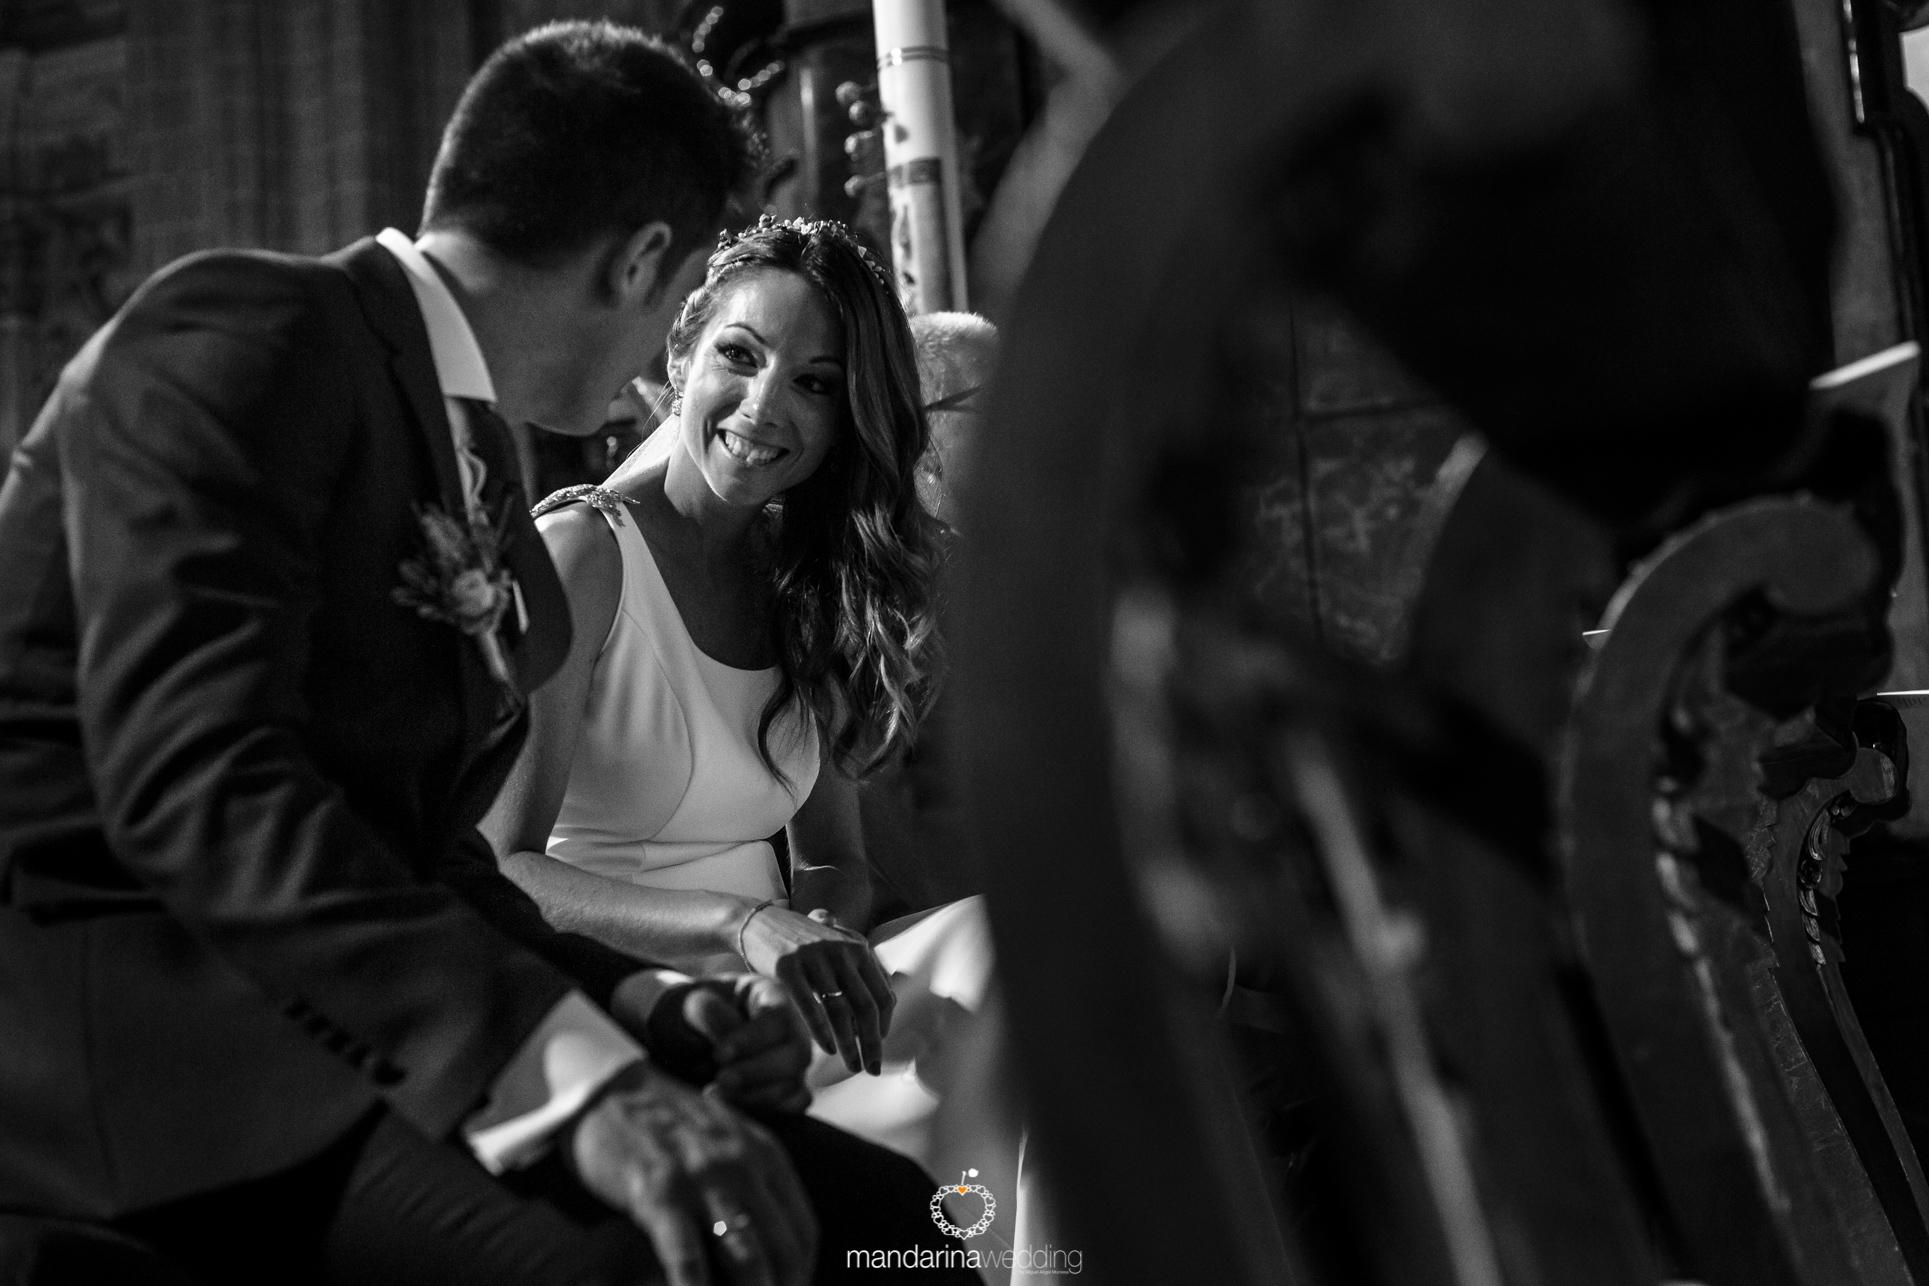 mandarina wedding, fotografo boda pais vasco, fotografo boda zaragoza, fotógrafo boda soria, fotografo boda Madrid, fotógrafo boda tarragona-22